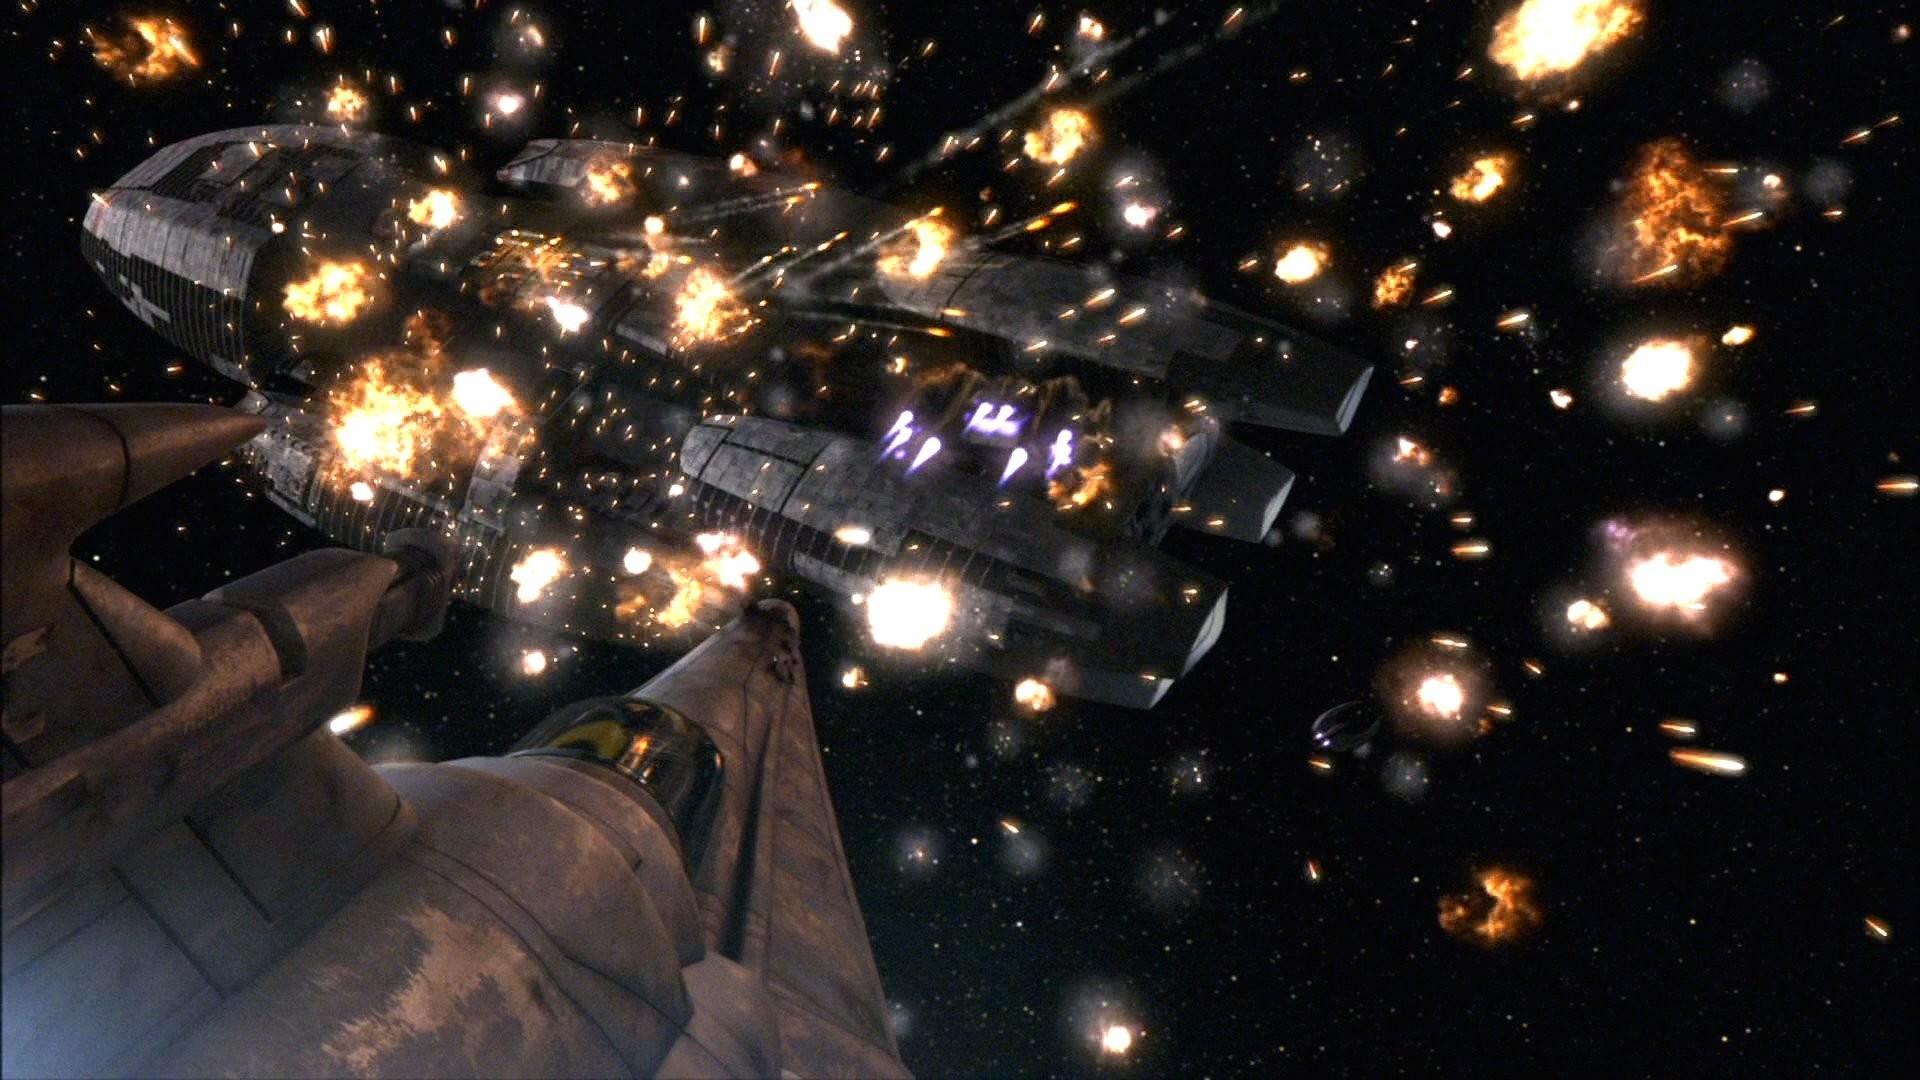 Battlestar Galactica 1978 Wallpaper – WallpaperSafari